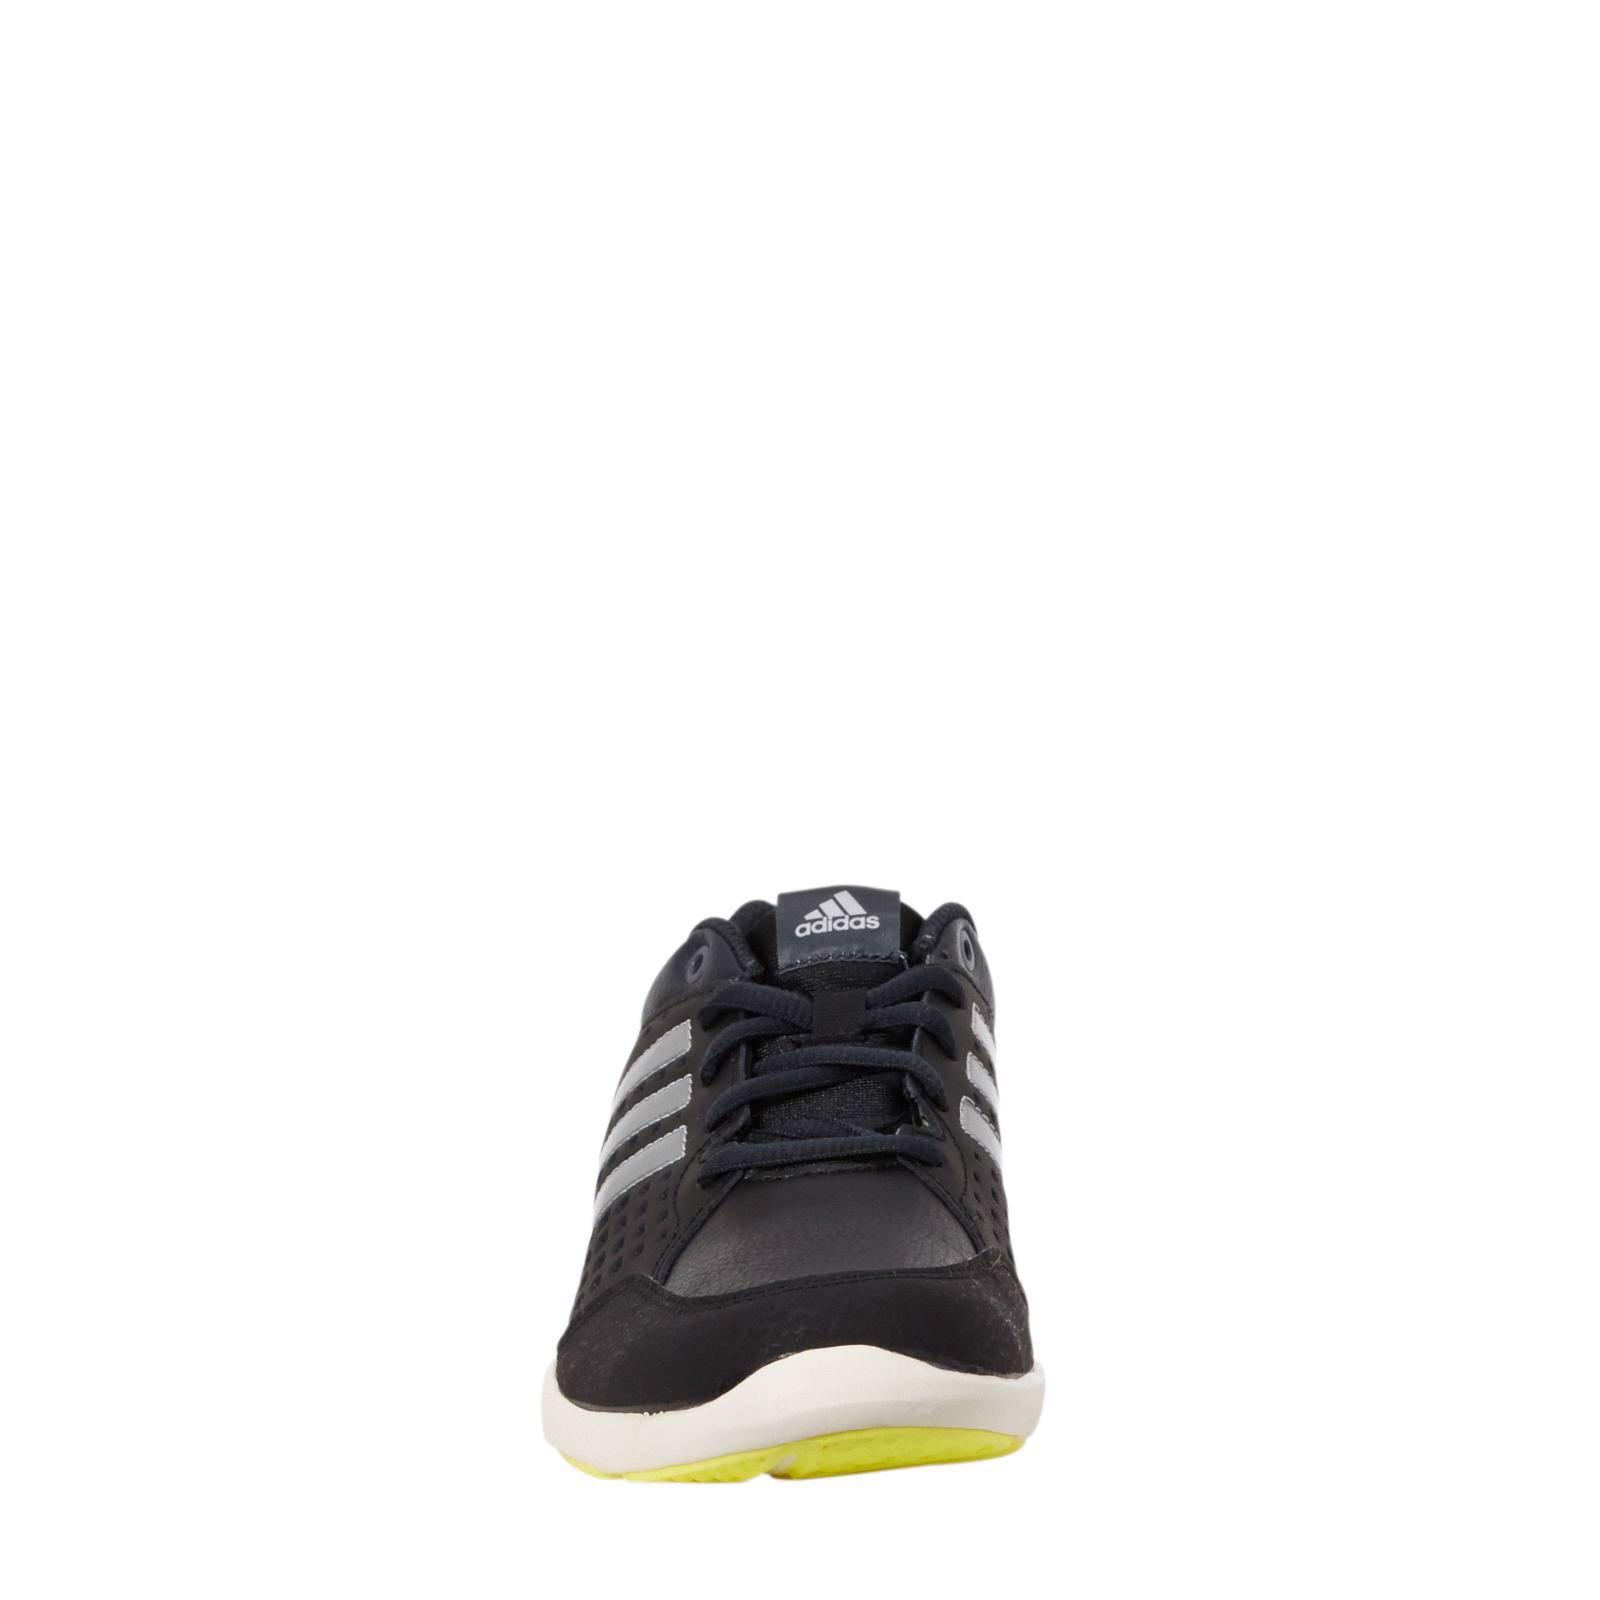 adidas performance fitness schoenen Arianna 3 | wehkamp